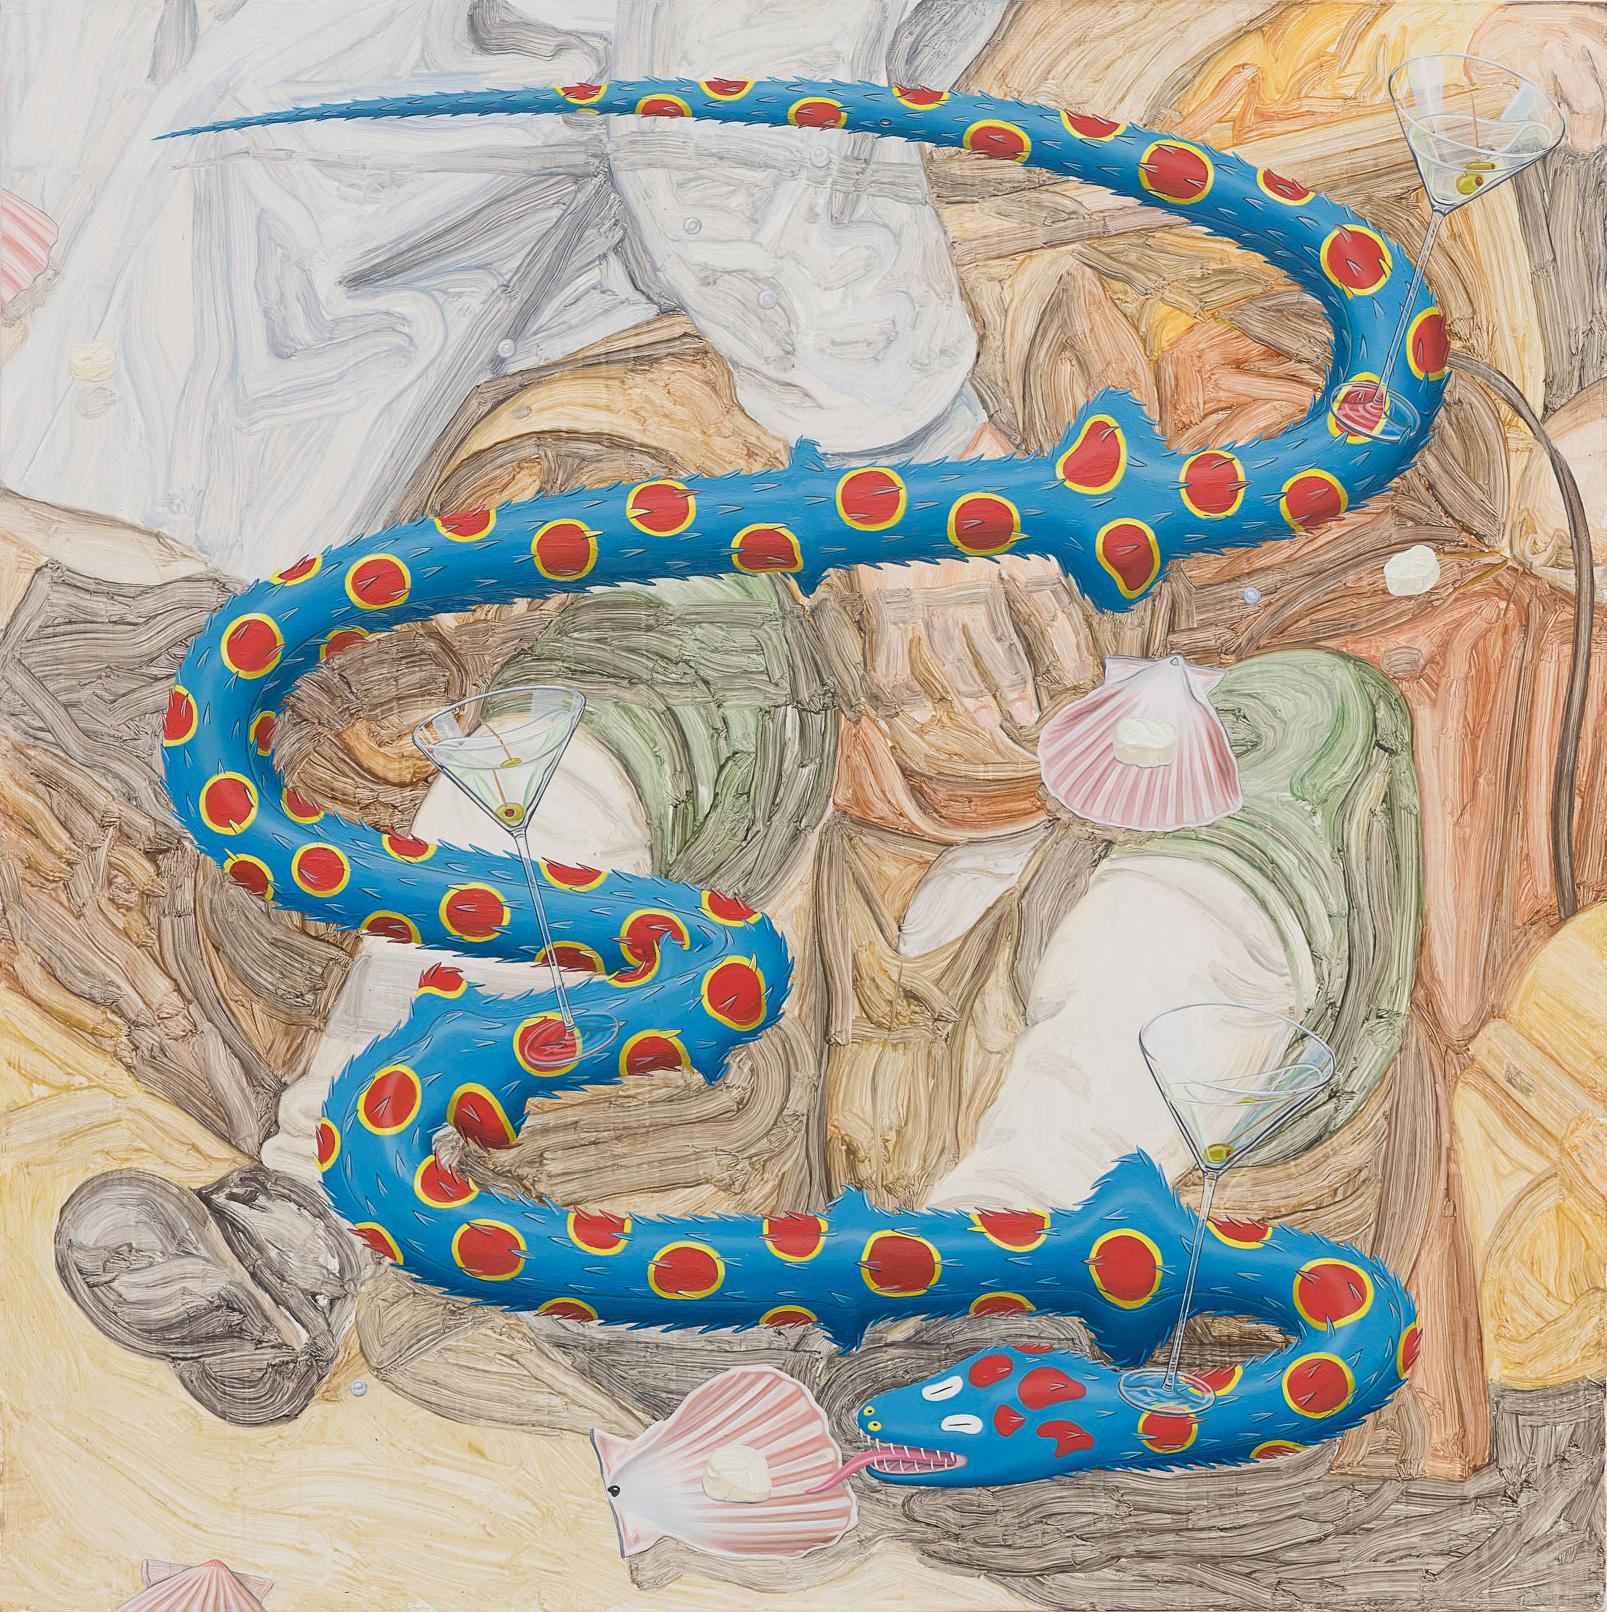 Tristan Pigott  Scallop Wars- Martini Glass, Scallop Eating, Pearl Shitting Snake, 2018 Oil on board 36 x 36 cm